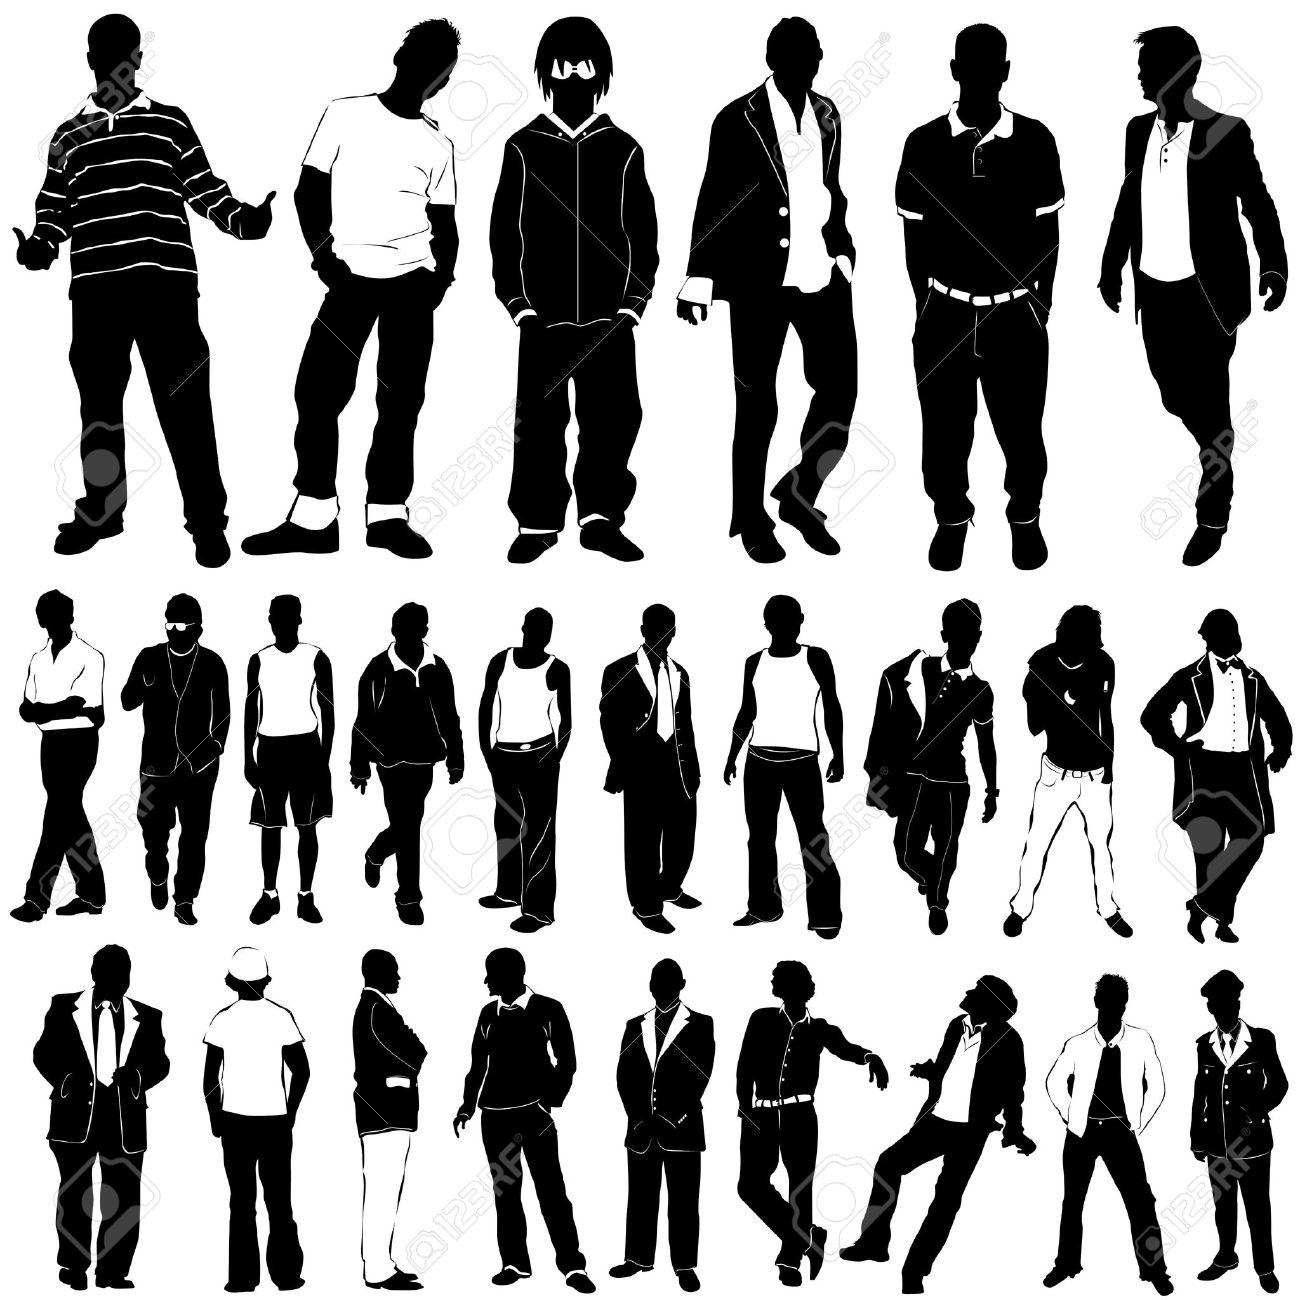 1e1fb8fbb1f Fashion men vector clothes detail royalty free cliparts vectors jpg  1300x1300 Mens fashion silhouette